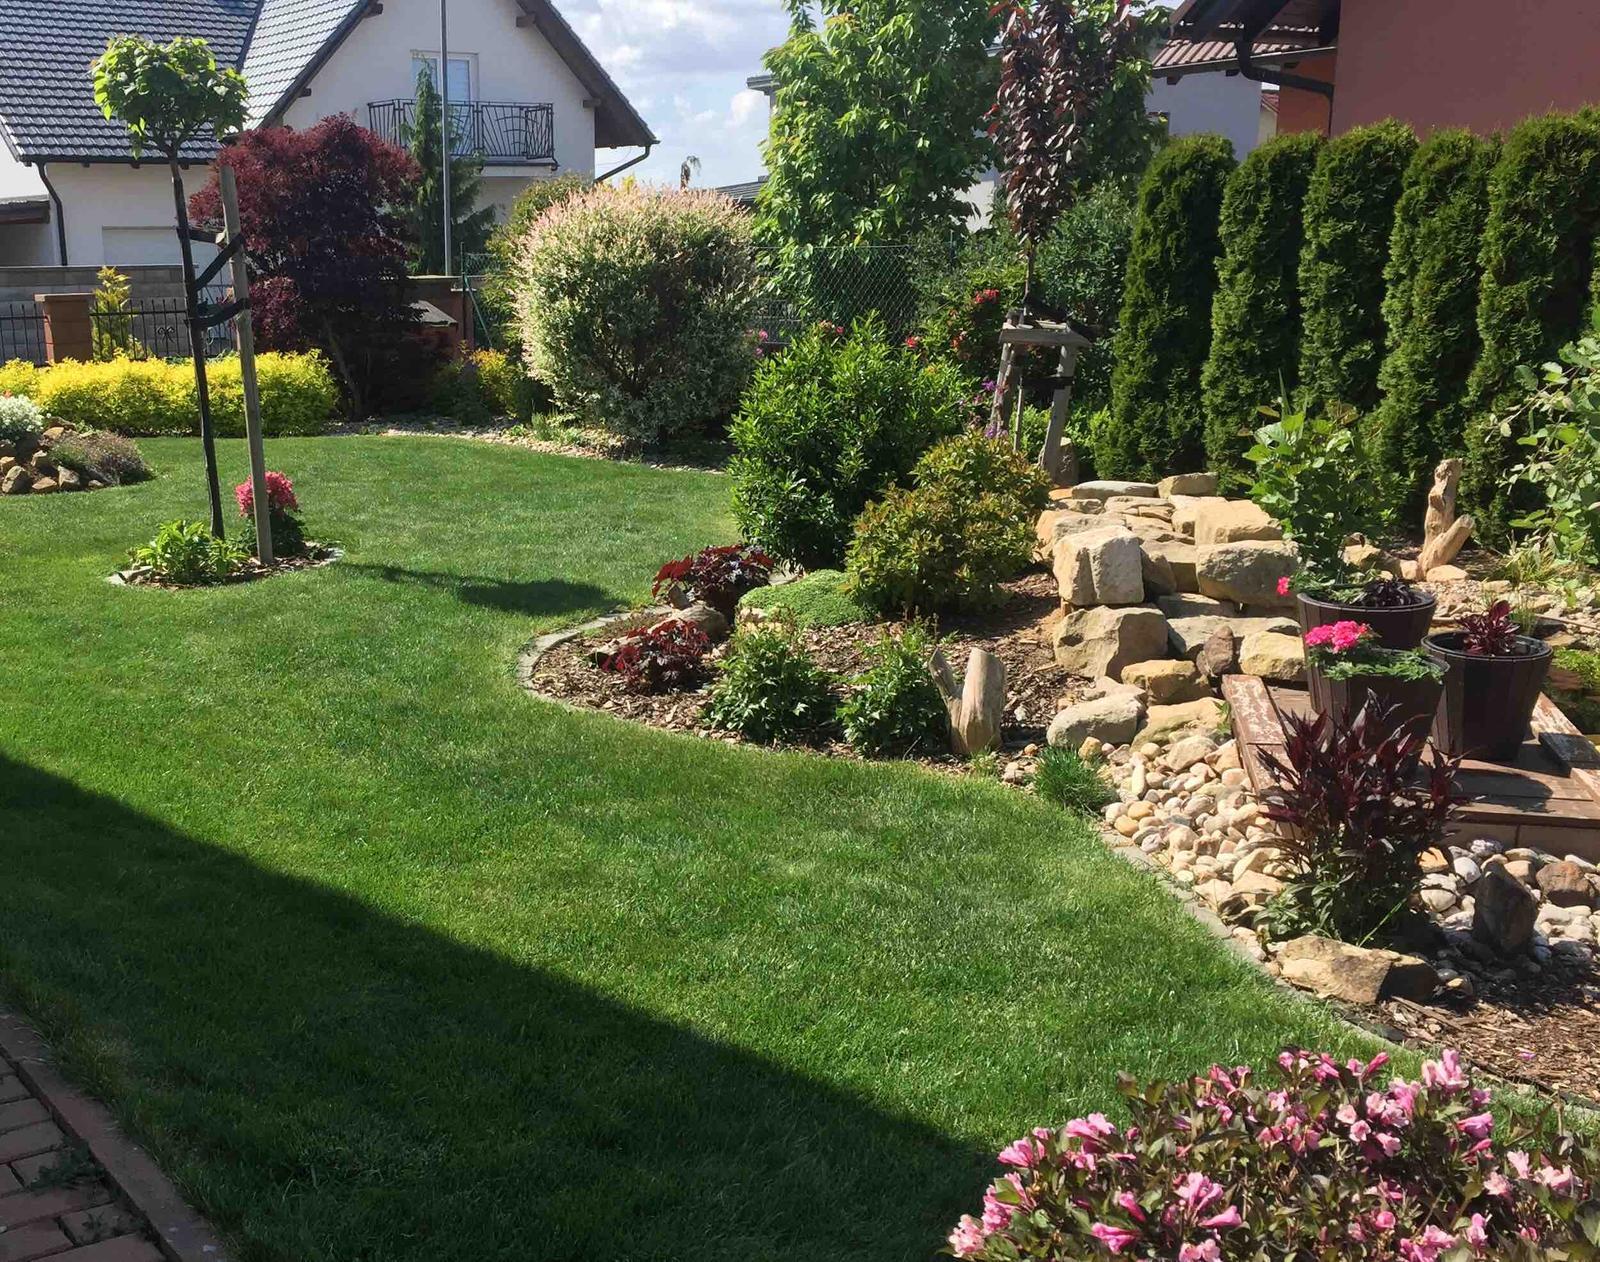 Naše barevná zahrada 🌸 - V zahradě to už krásně hraje barvami 🌸